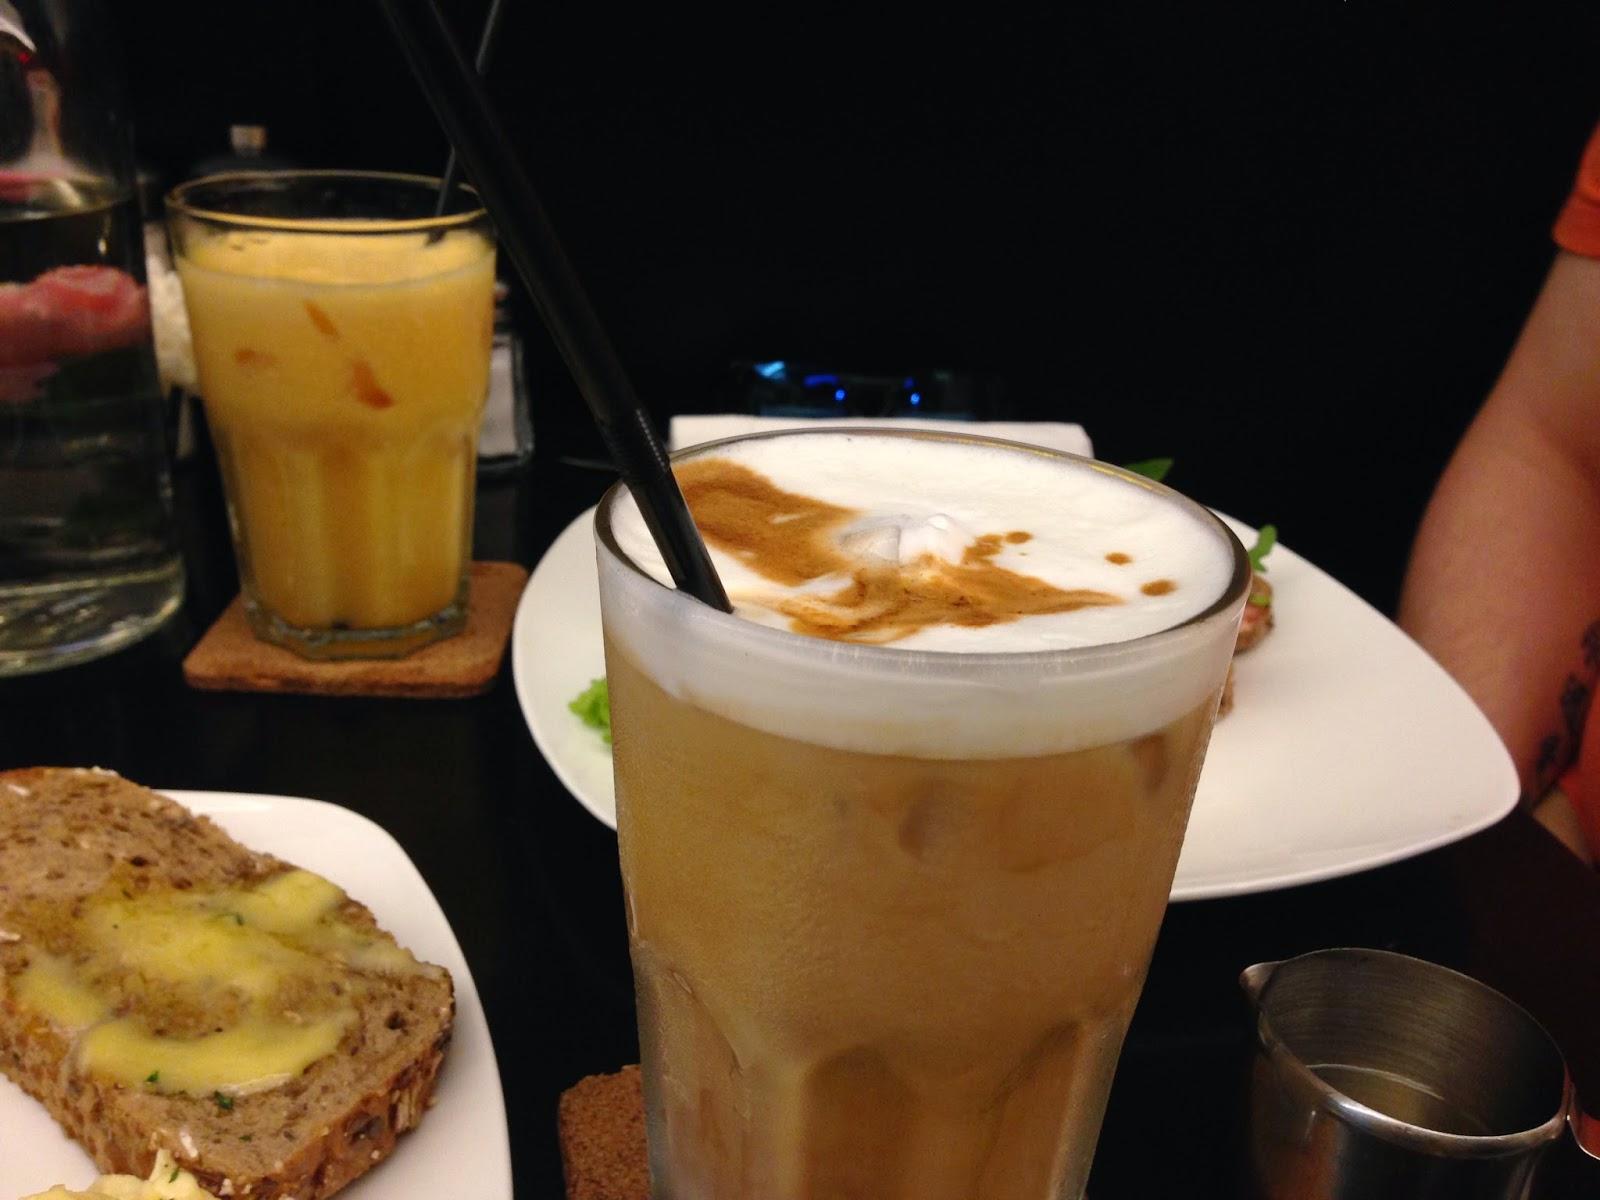 Iced Latte, Fresh Orange Juice